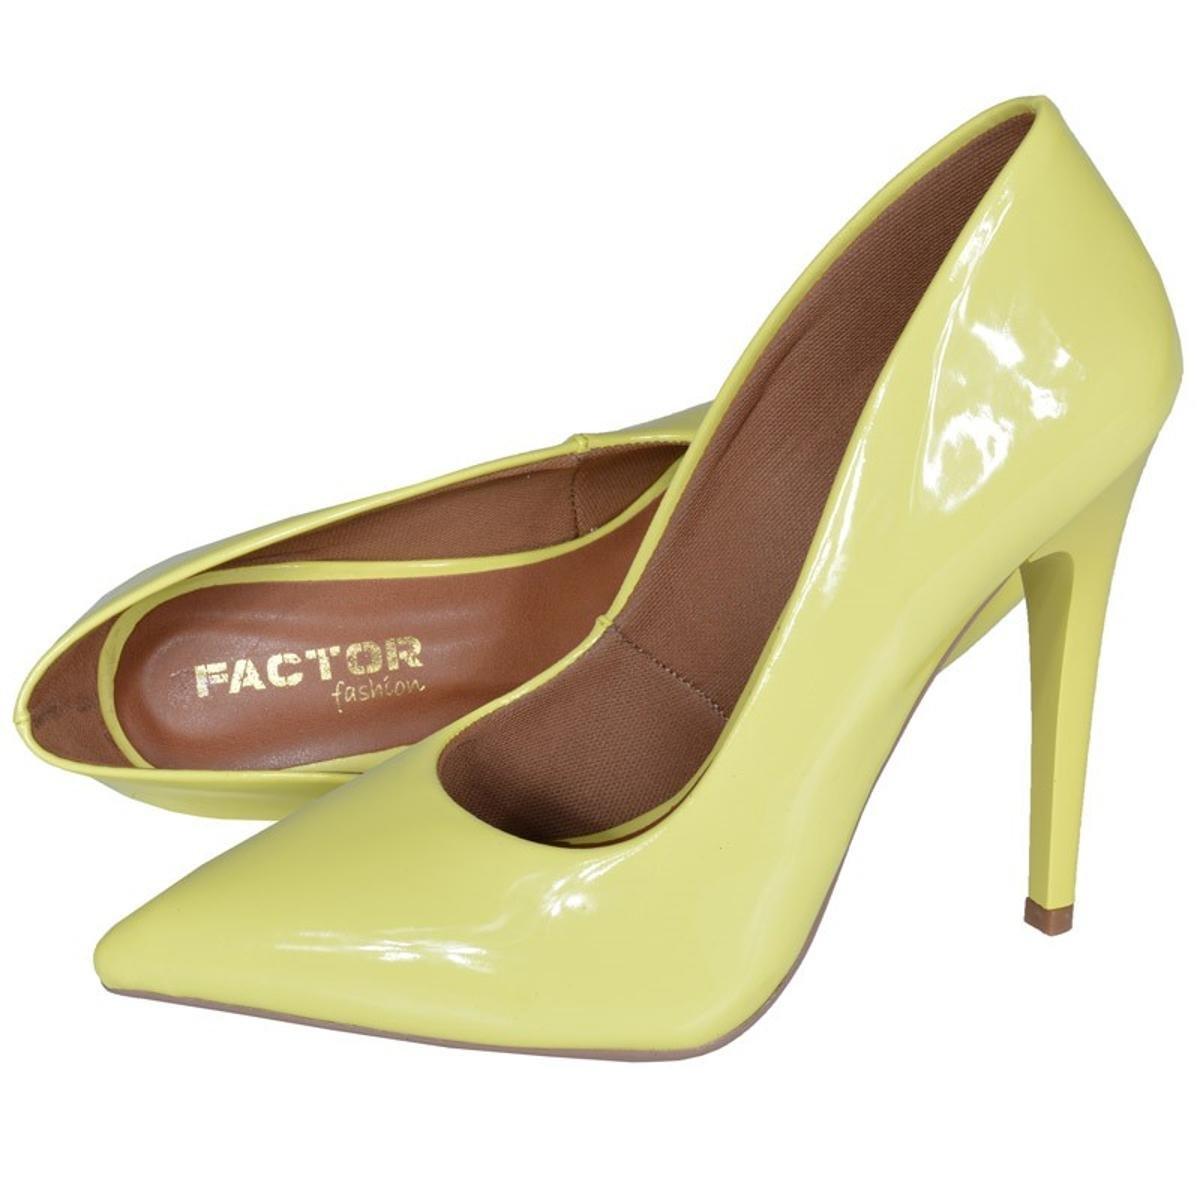 Scarpin Eagle Black Fashion Alto Feminino - Amarelo